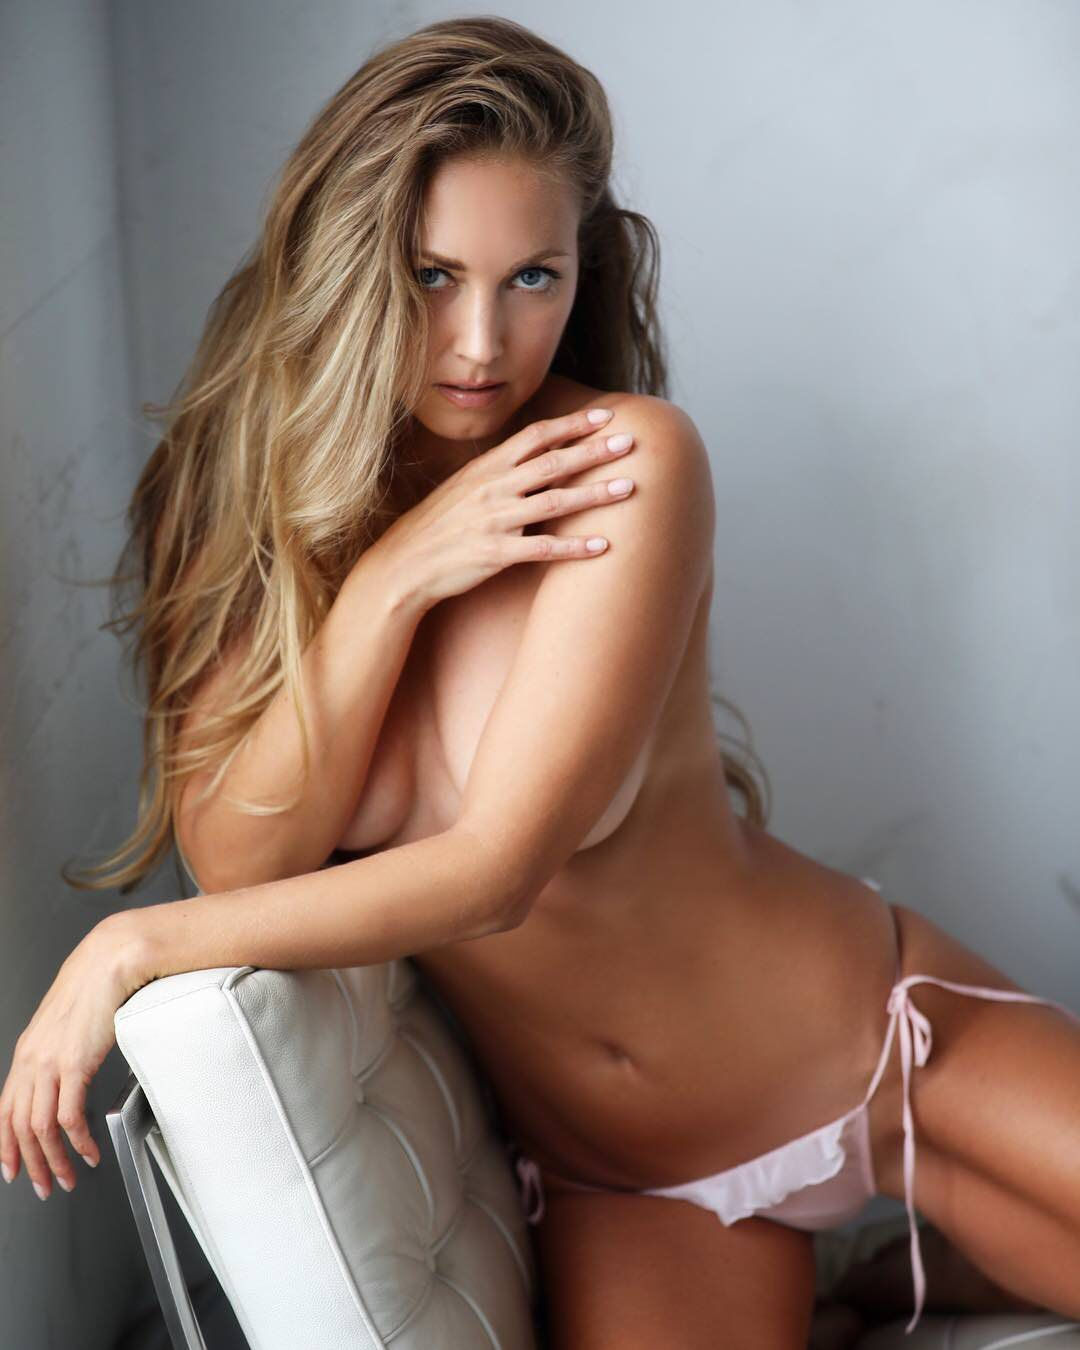 nora segura nude